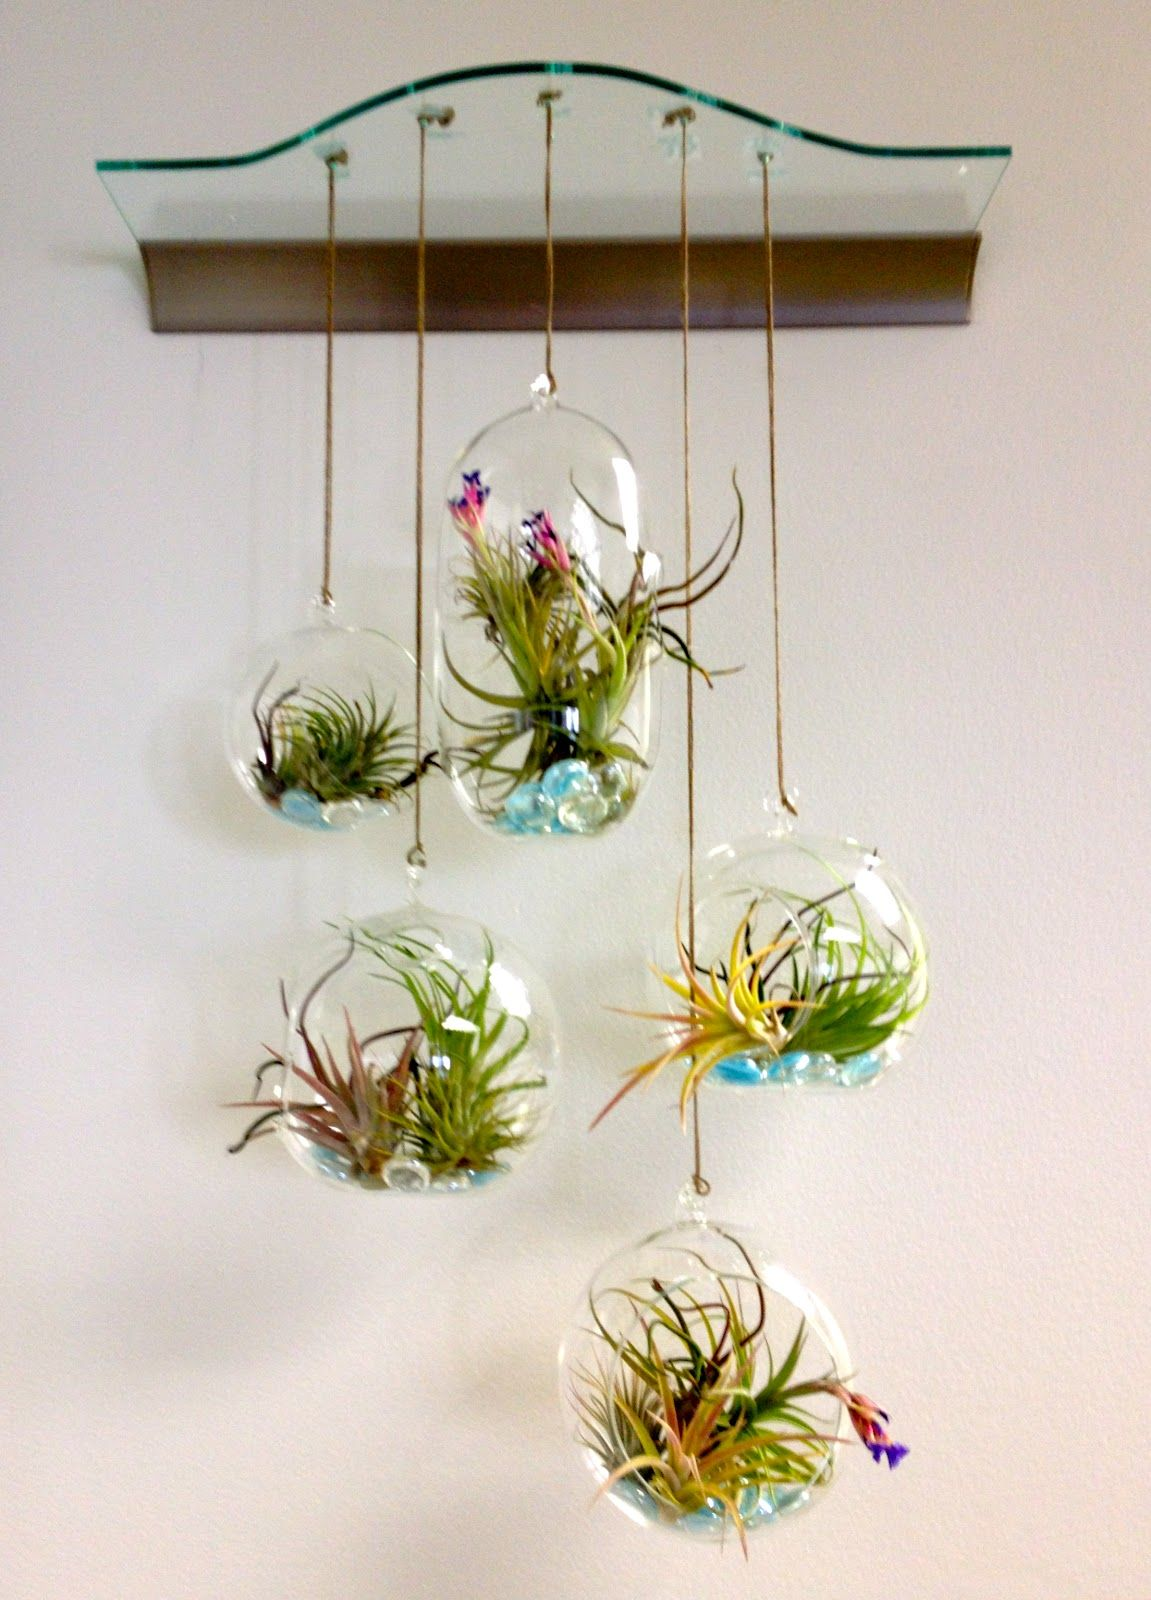 Exceptional Small Narrow Garden Ideas Part - 2 Air Plant Terrarium Glass  Container. Hanging ... - Exceptional Small Narrow Garden Ideas Part - 2 Air Plant Terrarium